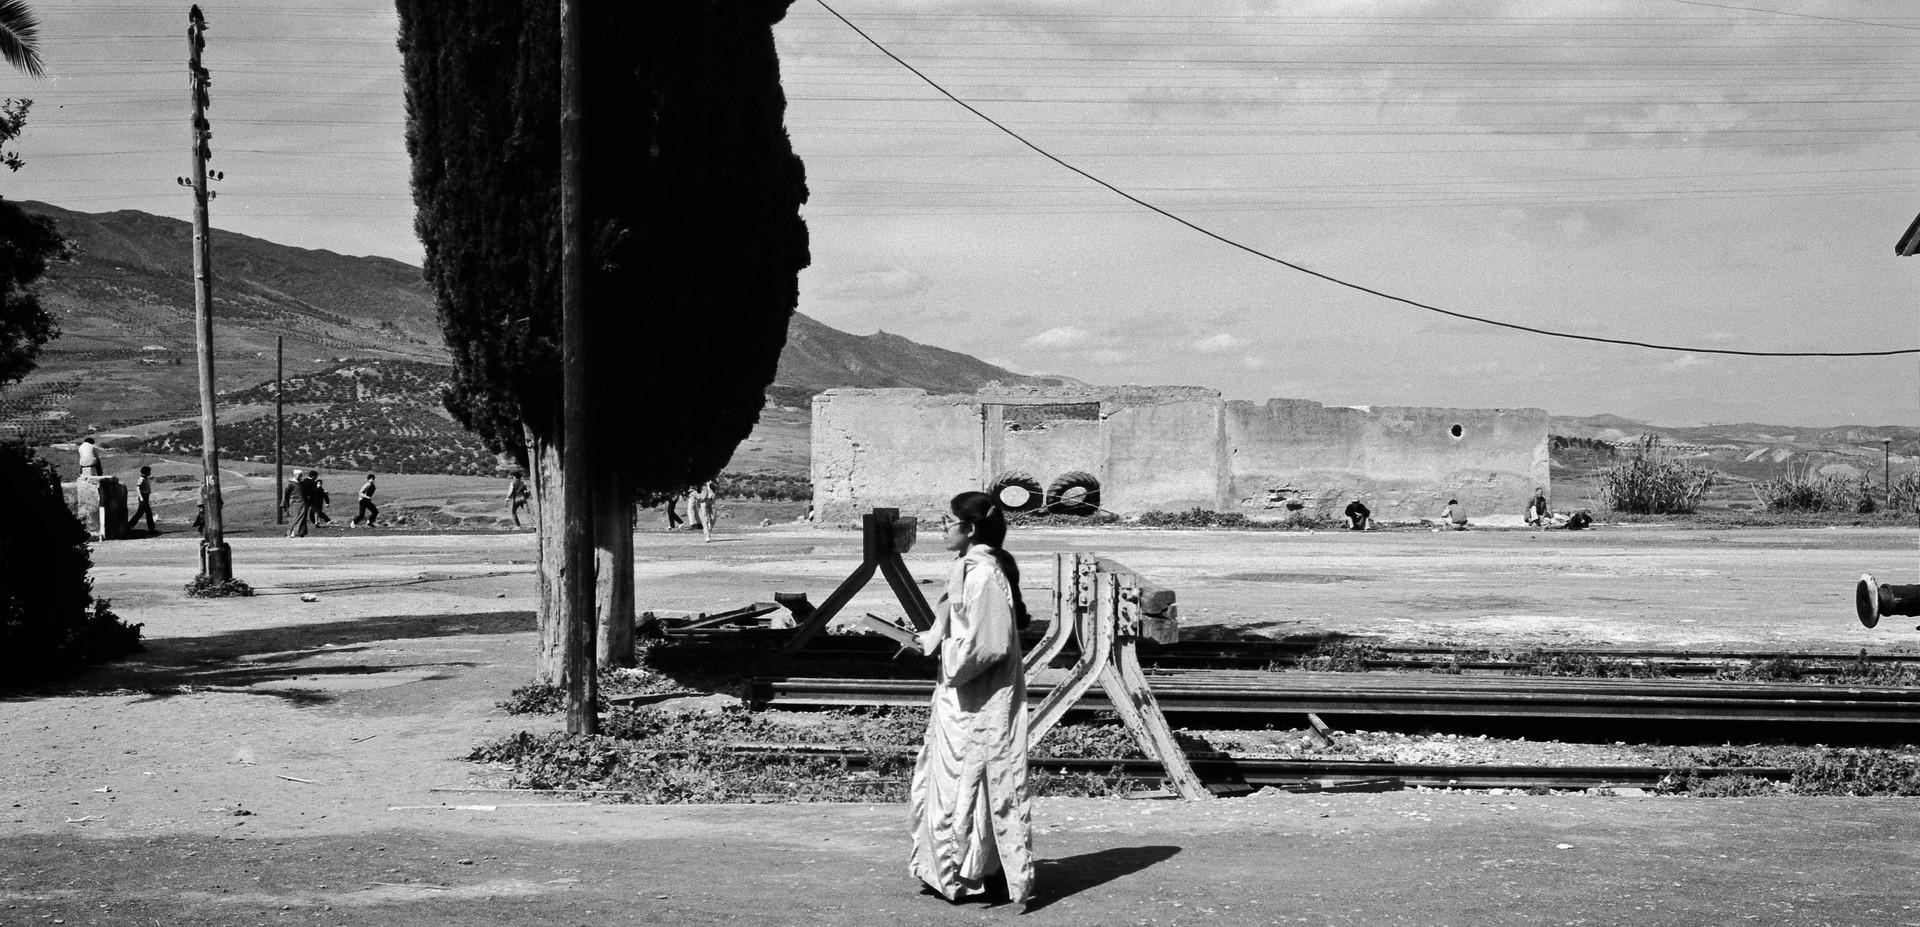 Station_Northern Morocco 1986